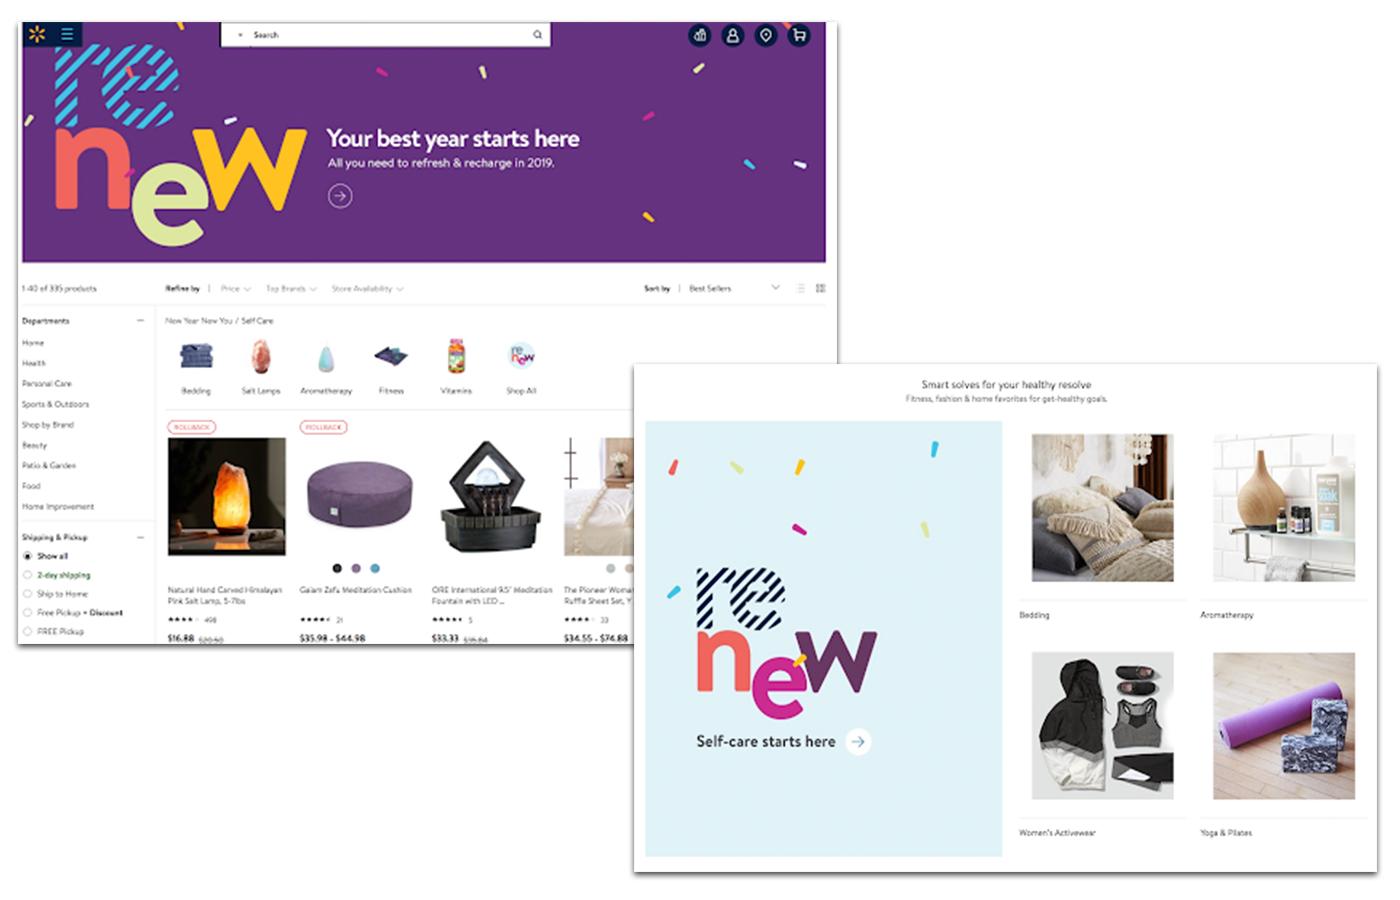 retail-collage-4